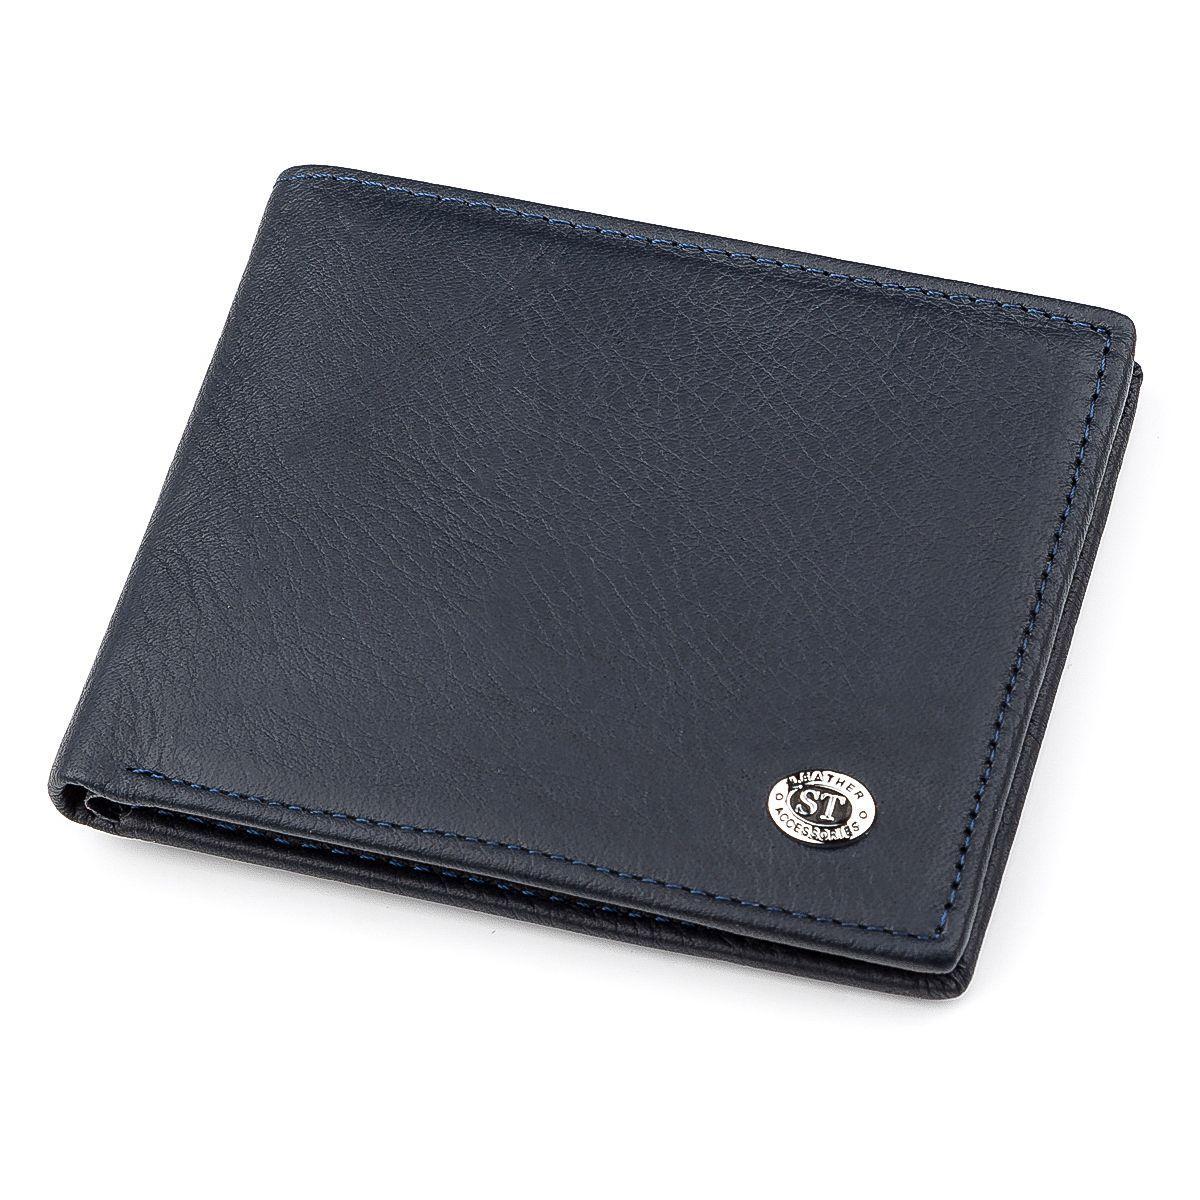 Мужской кошелек ST Leather 18321 (ST160) кожа Синий